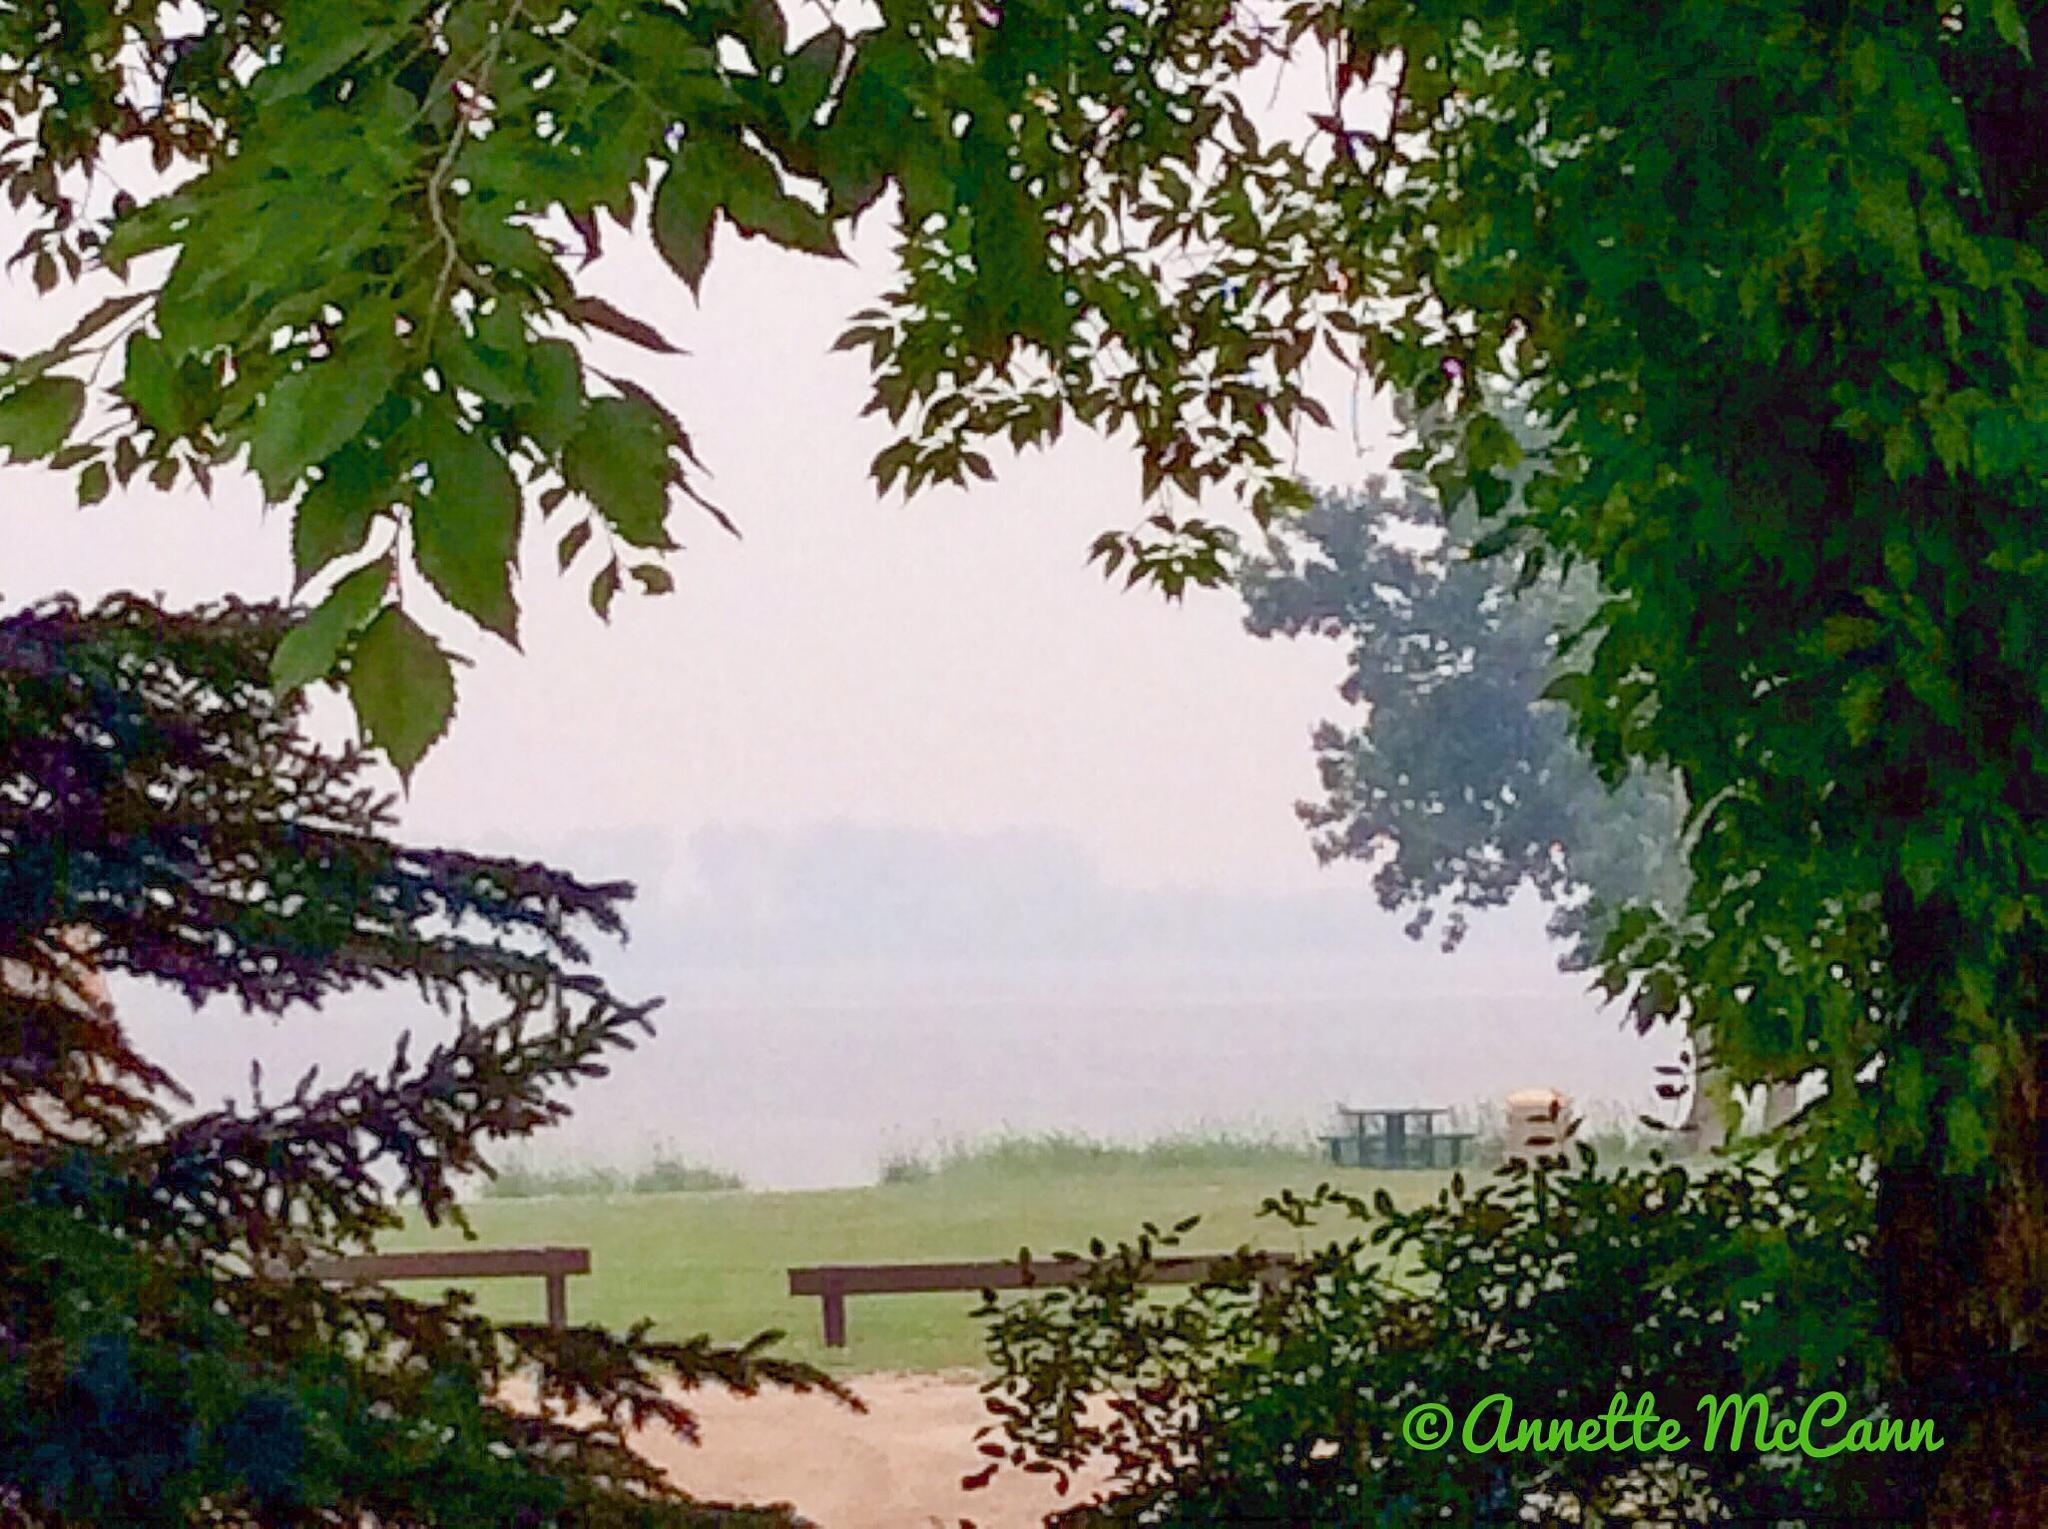 Smoke through the trees by Annette McCann